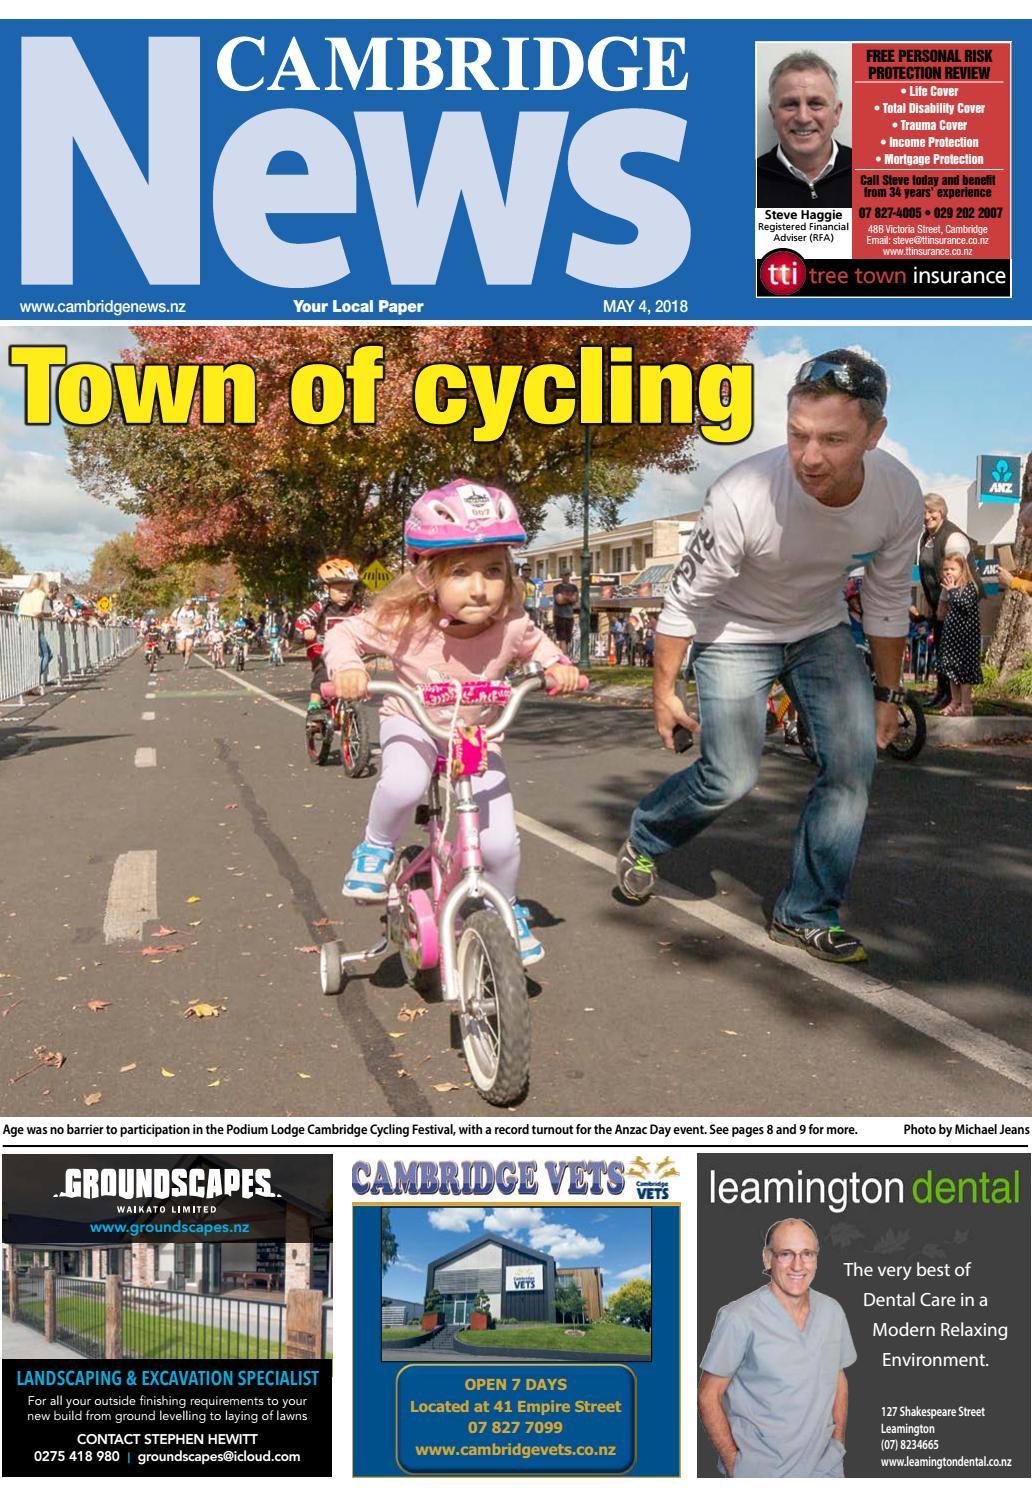 Cambridge News | 5 May 2018 by Cambridge News & Te Awamutu News - issuu